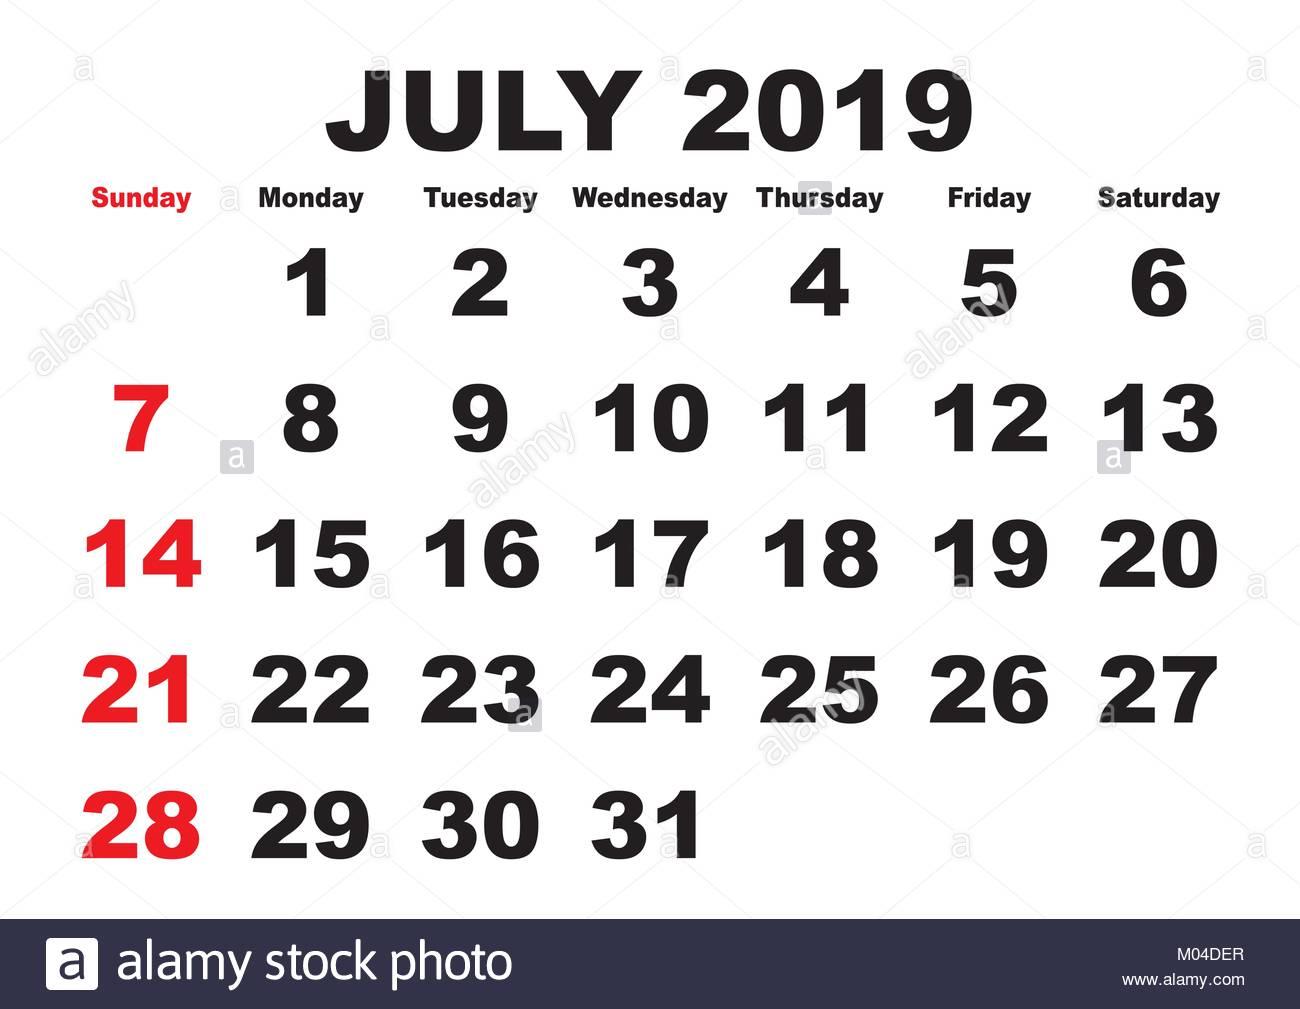 Calendario 31 Luglio 2019.2019 Calendario Mese Di Luglio Vettore Calendario